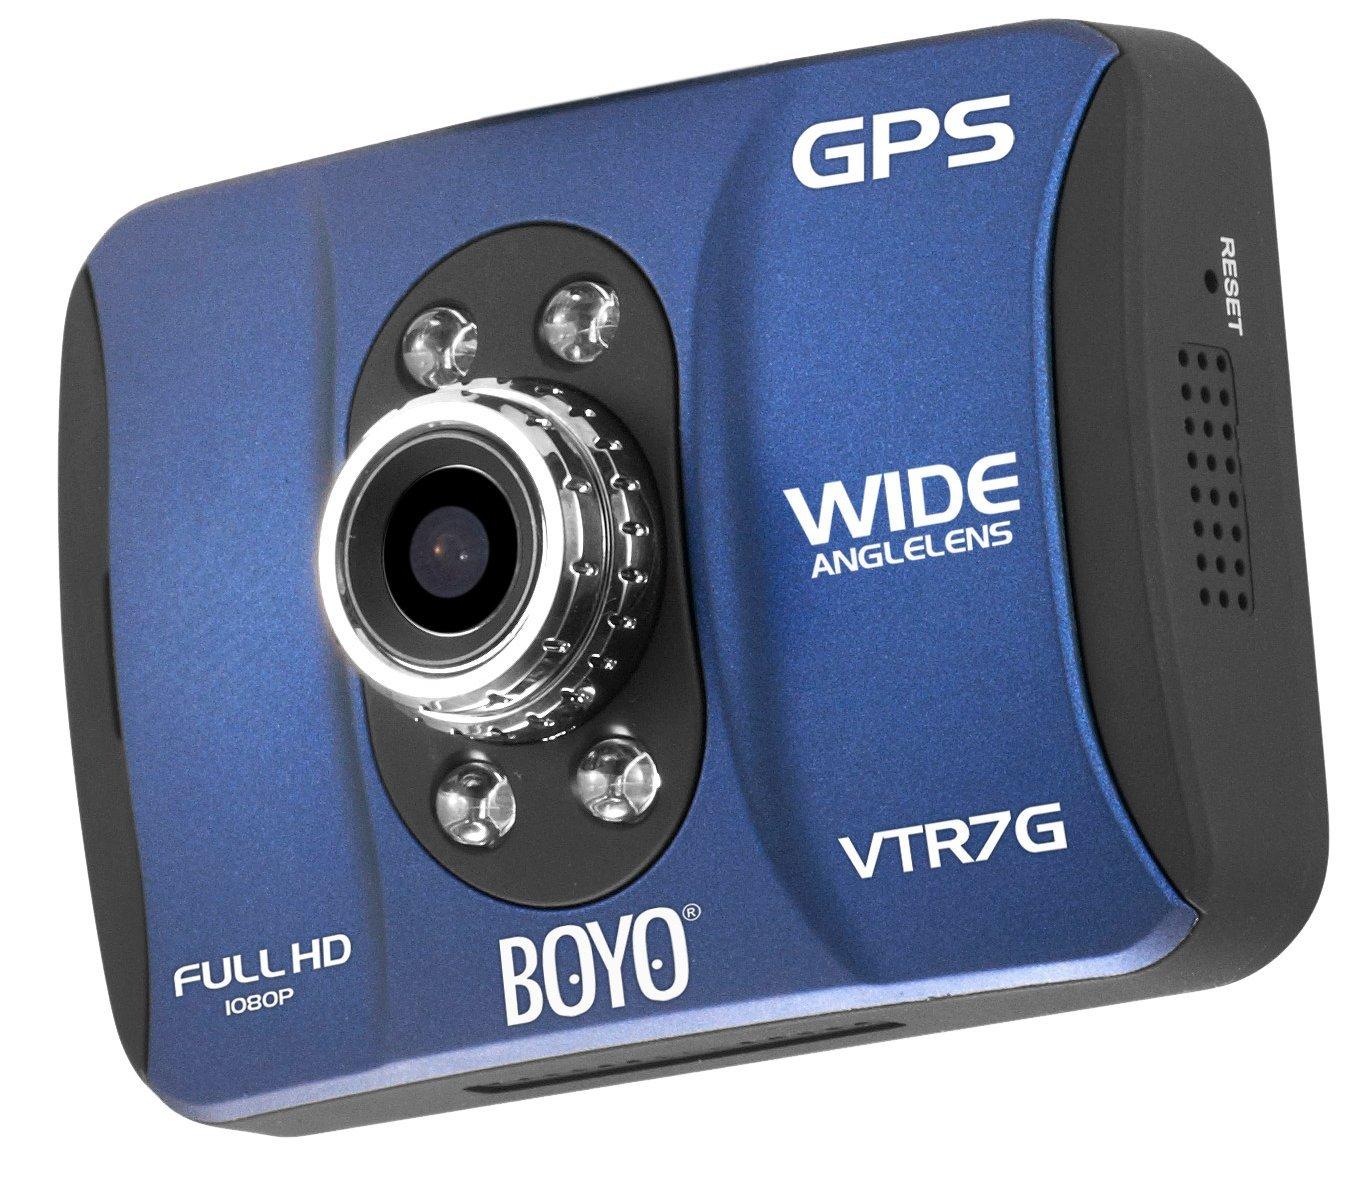 BOYO VTR7G Dash-Cam DVR with Full HD Recording